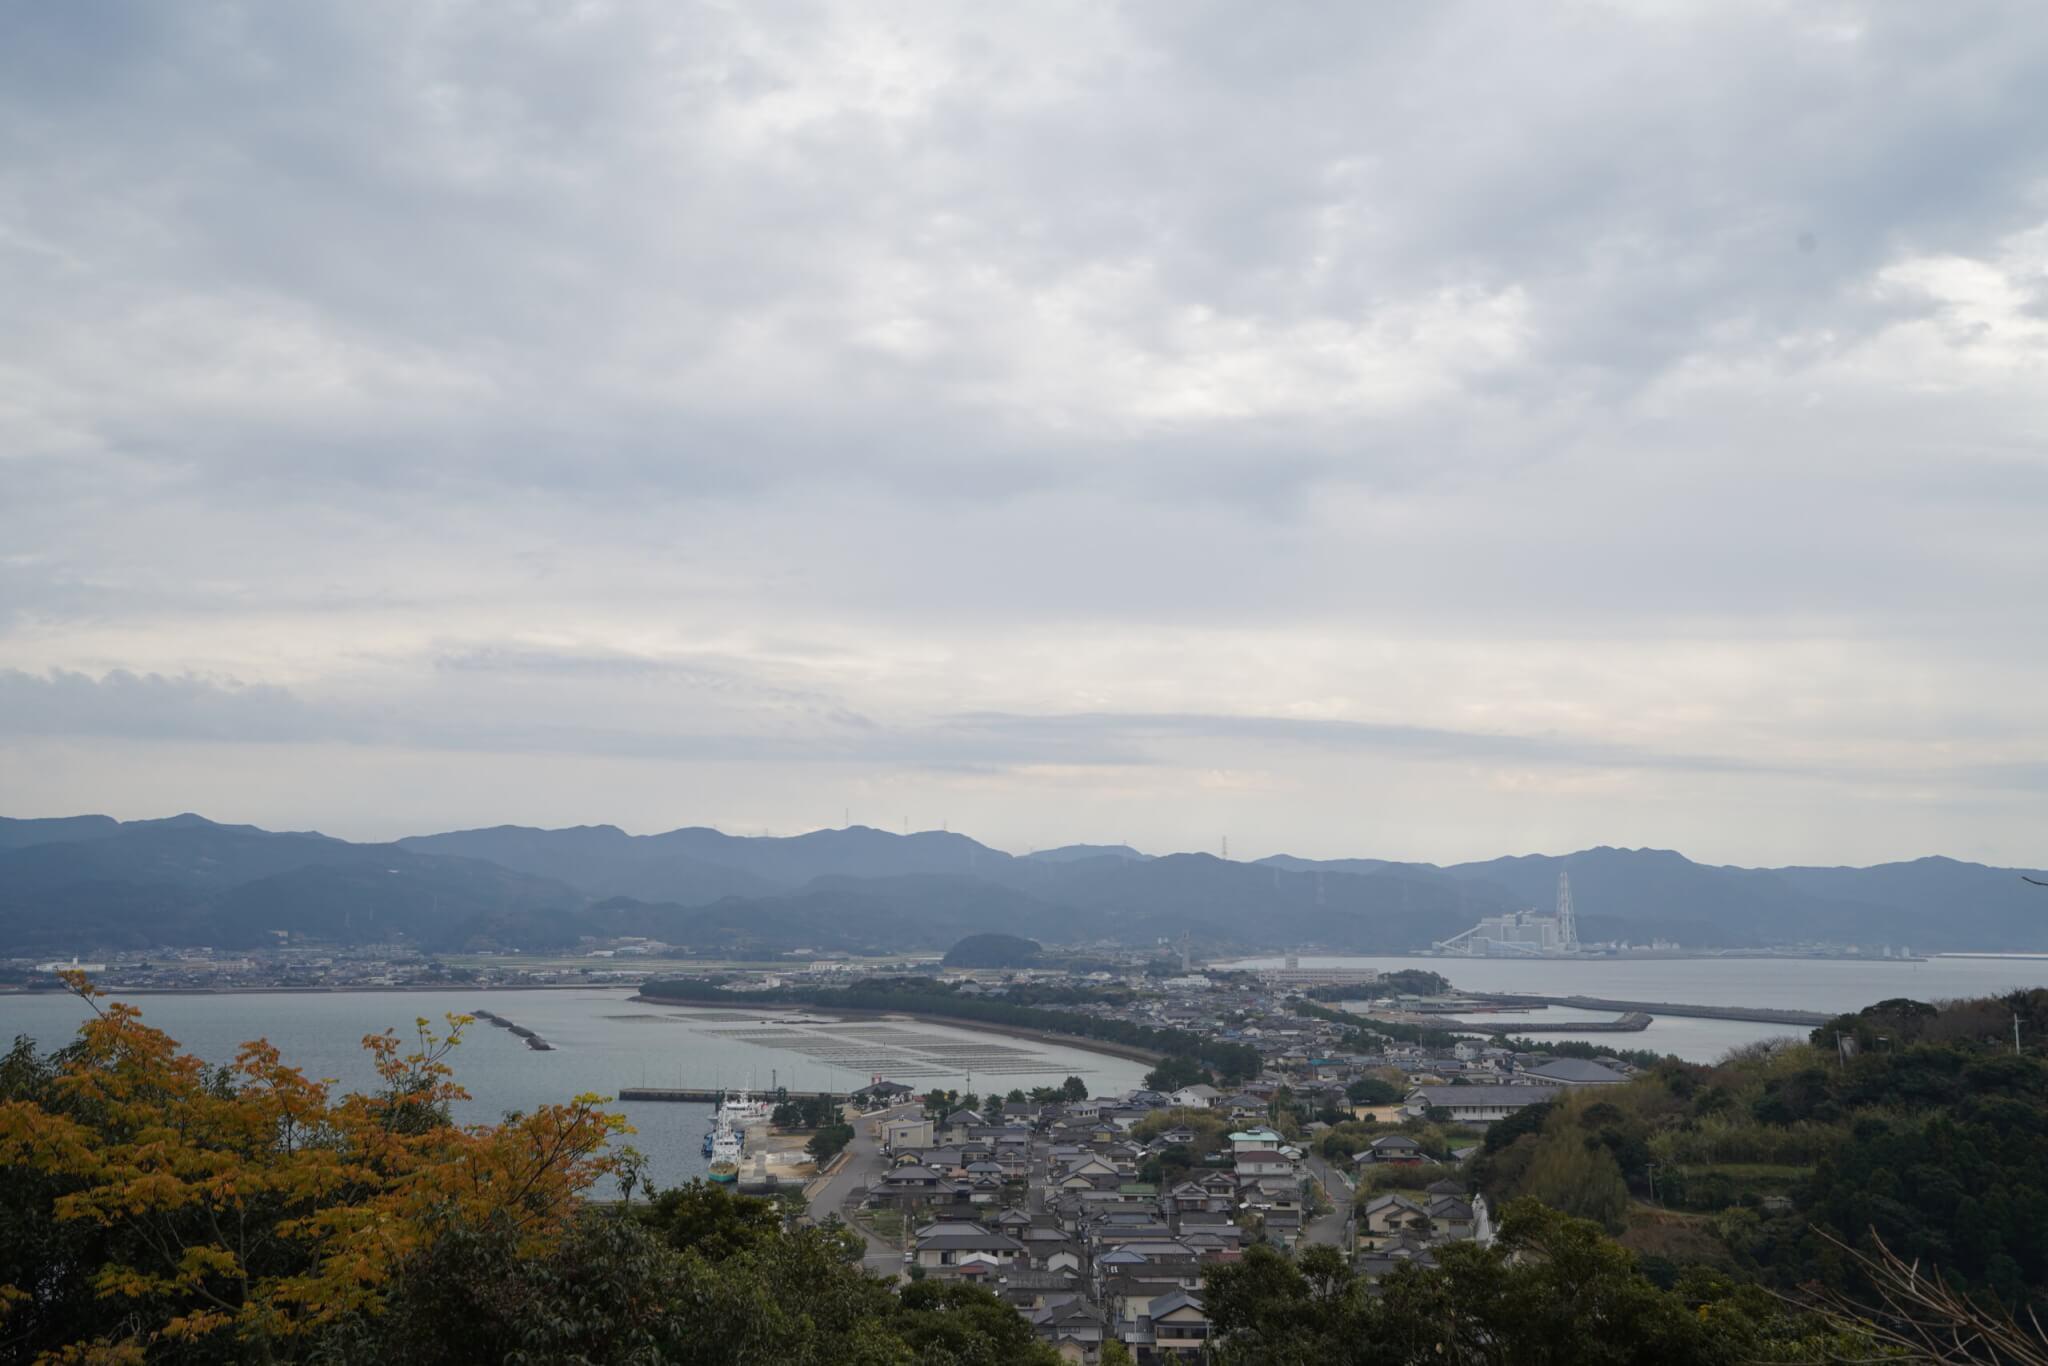 DSC00377 scaled - 【熊本・長崎旅5】歴史の舞台:天草・島原を知ると世界の思想が見え始める